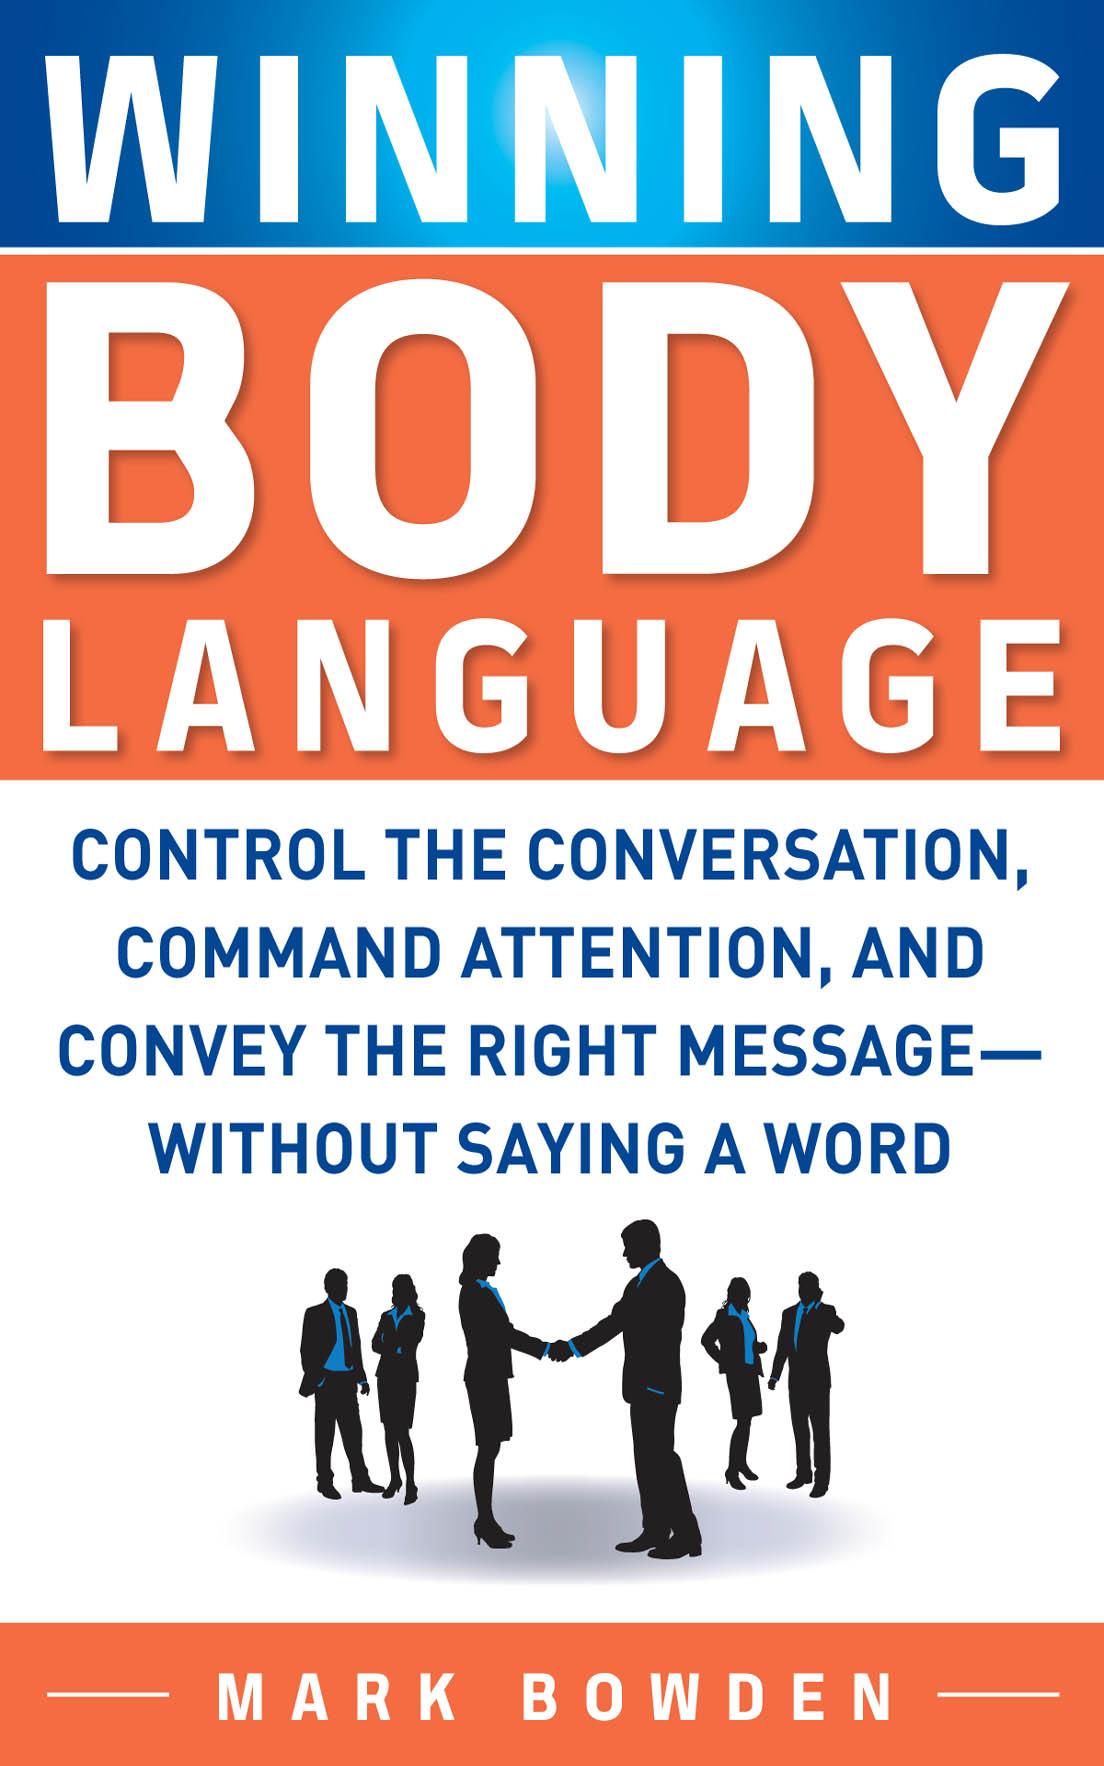 Download Ebook Winning Body Language by Mark Bowden Pdf